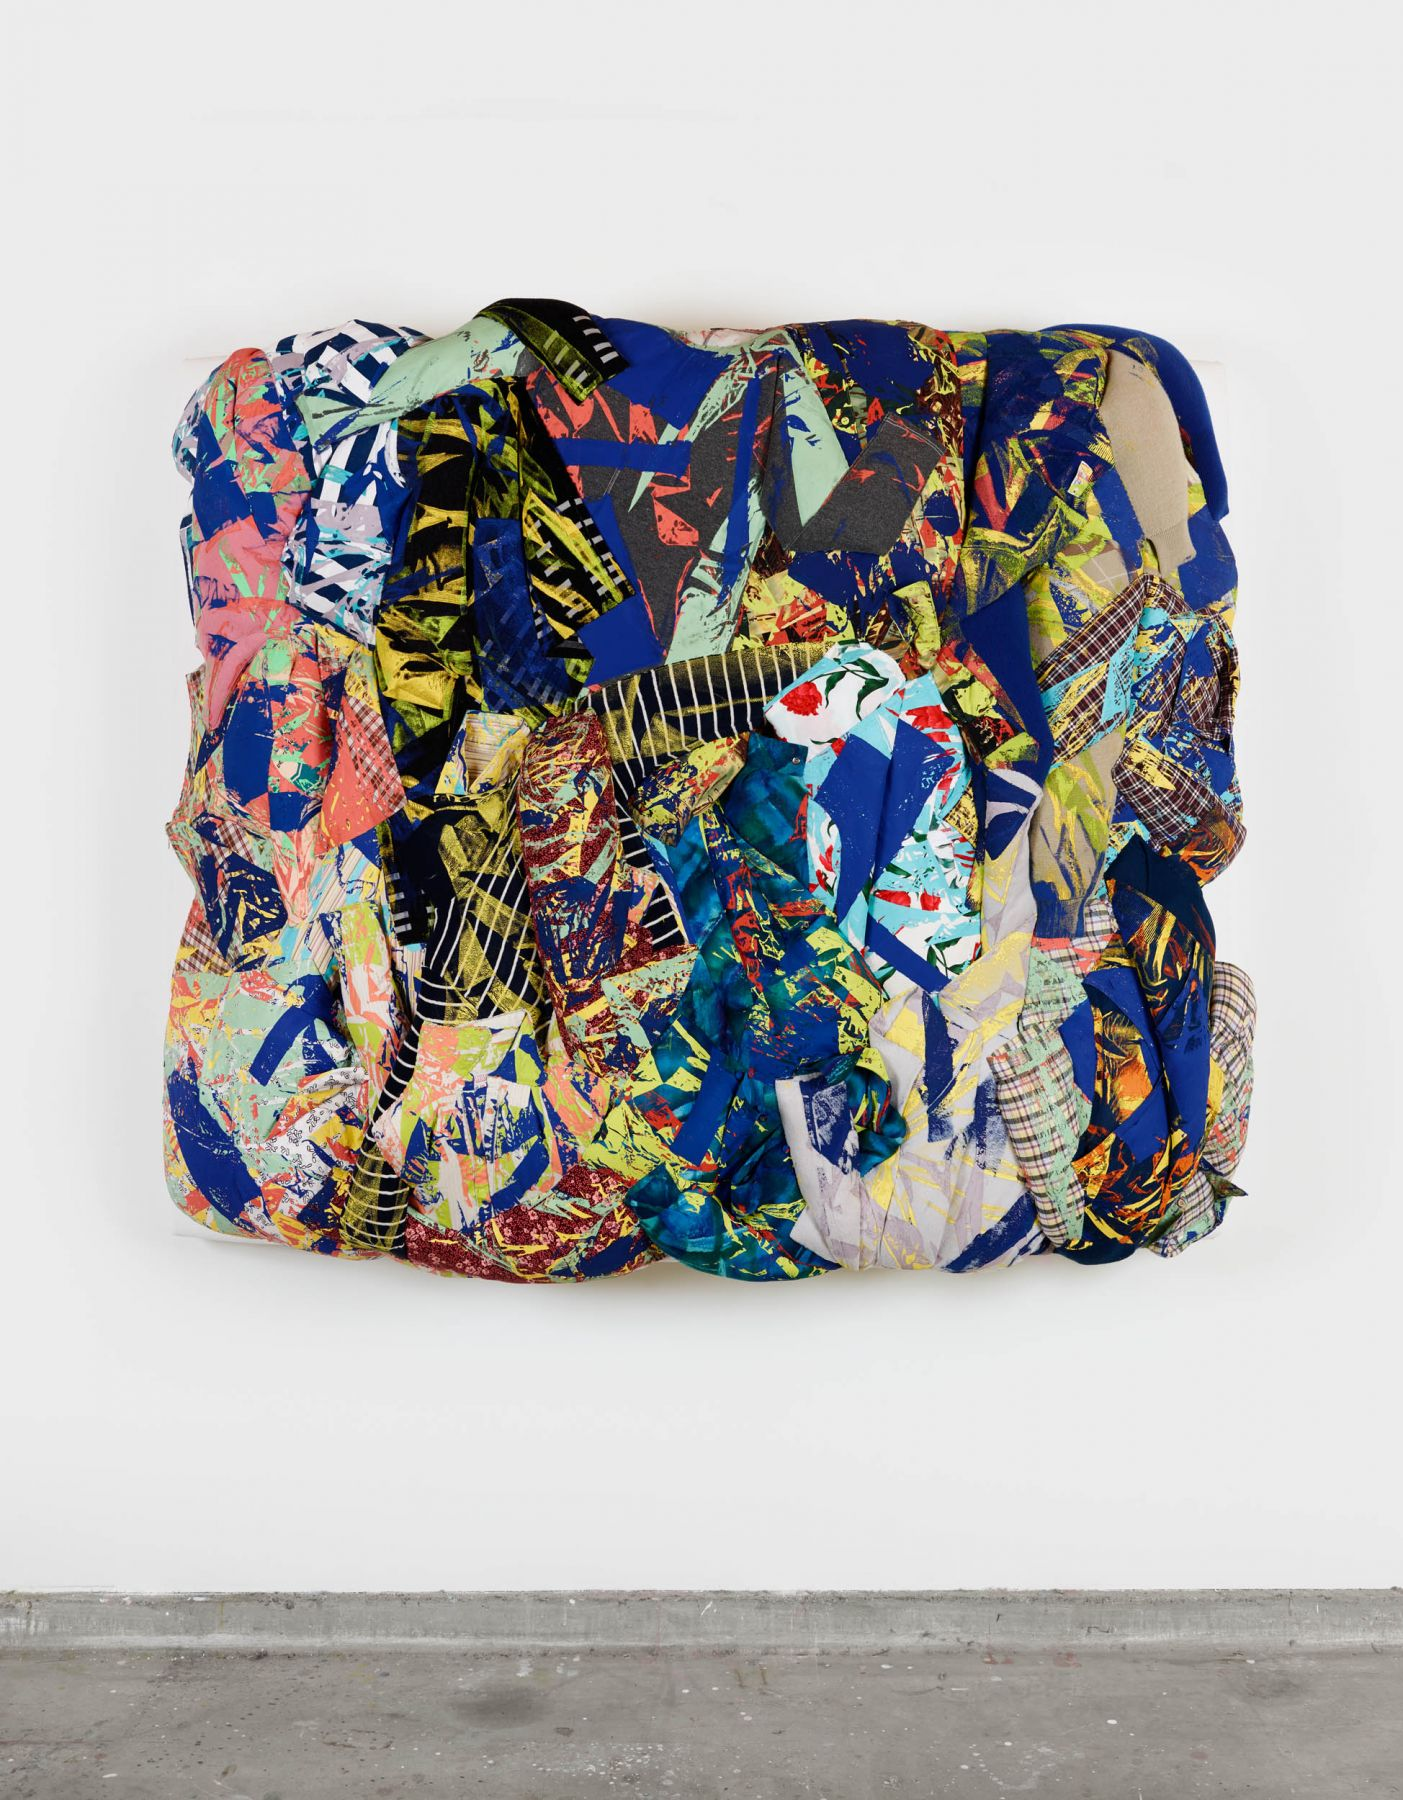 Untitled, 2017 Silkscreen on clothing, kapok, upholstery fabric, foam on wood support